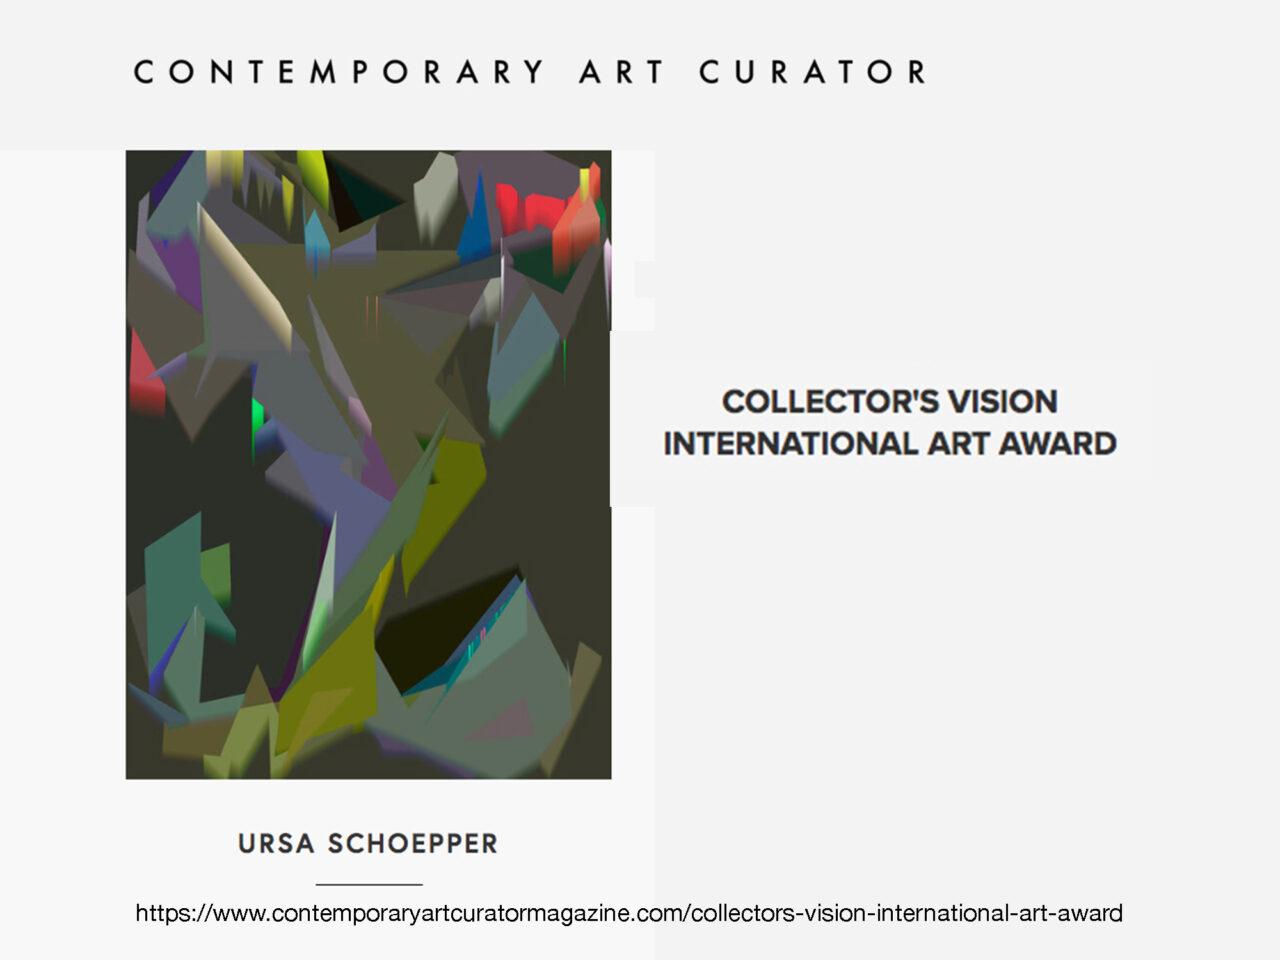 COLLECTOR'S  VISION  INTERNATIONAL  ART  AWARD 2021 image